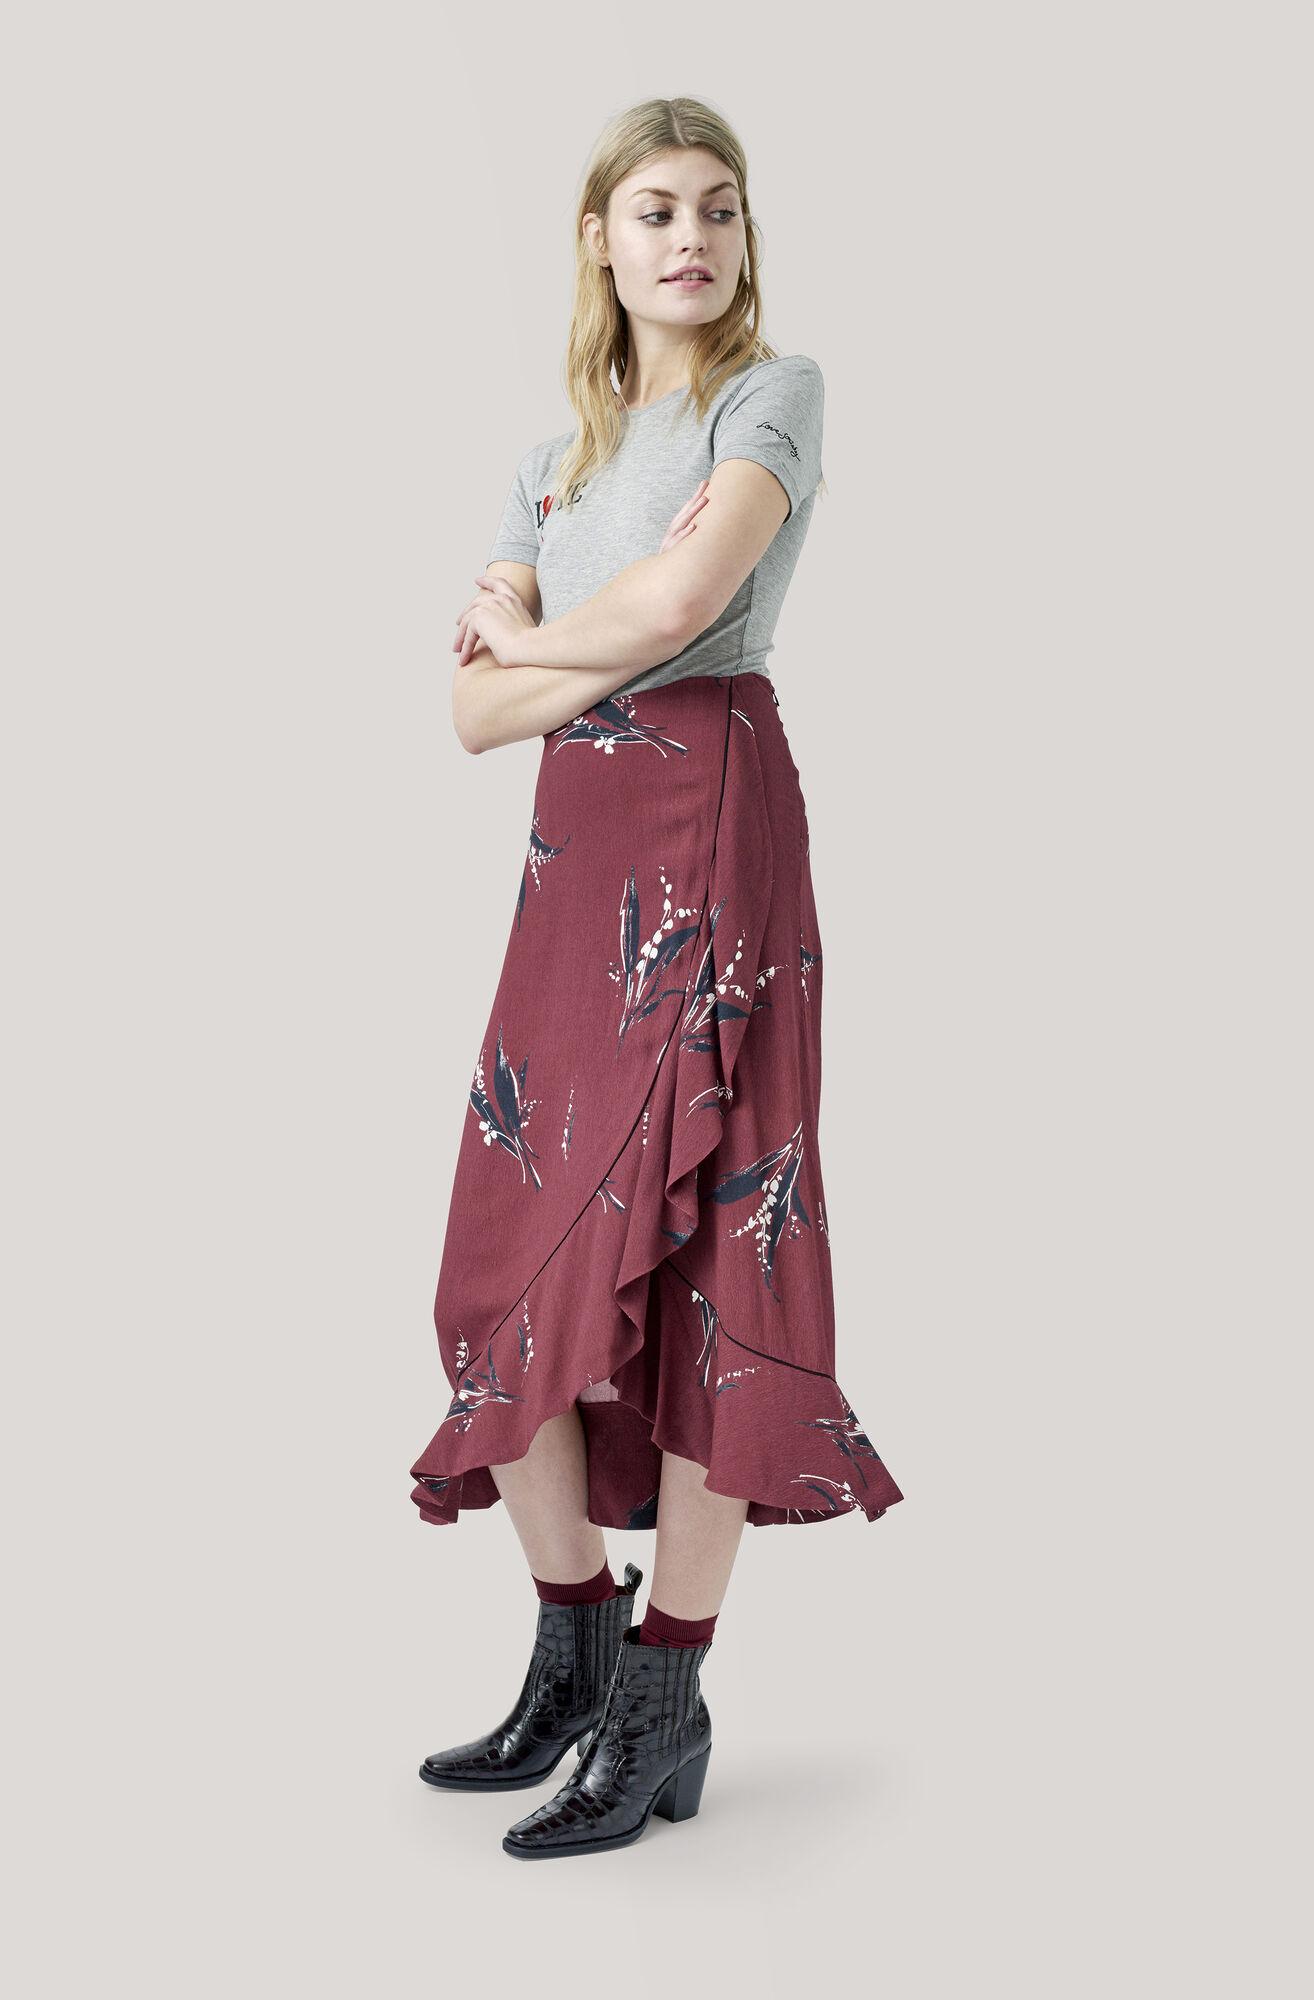 Montrose Crepe Skirt, Decadent Chocolate, hi-res